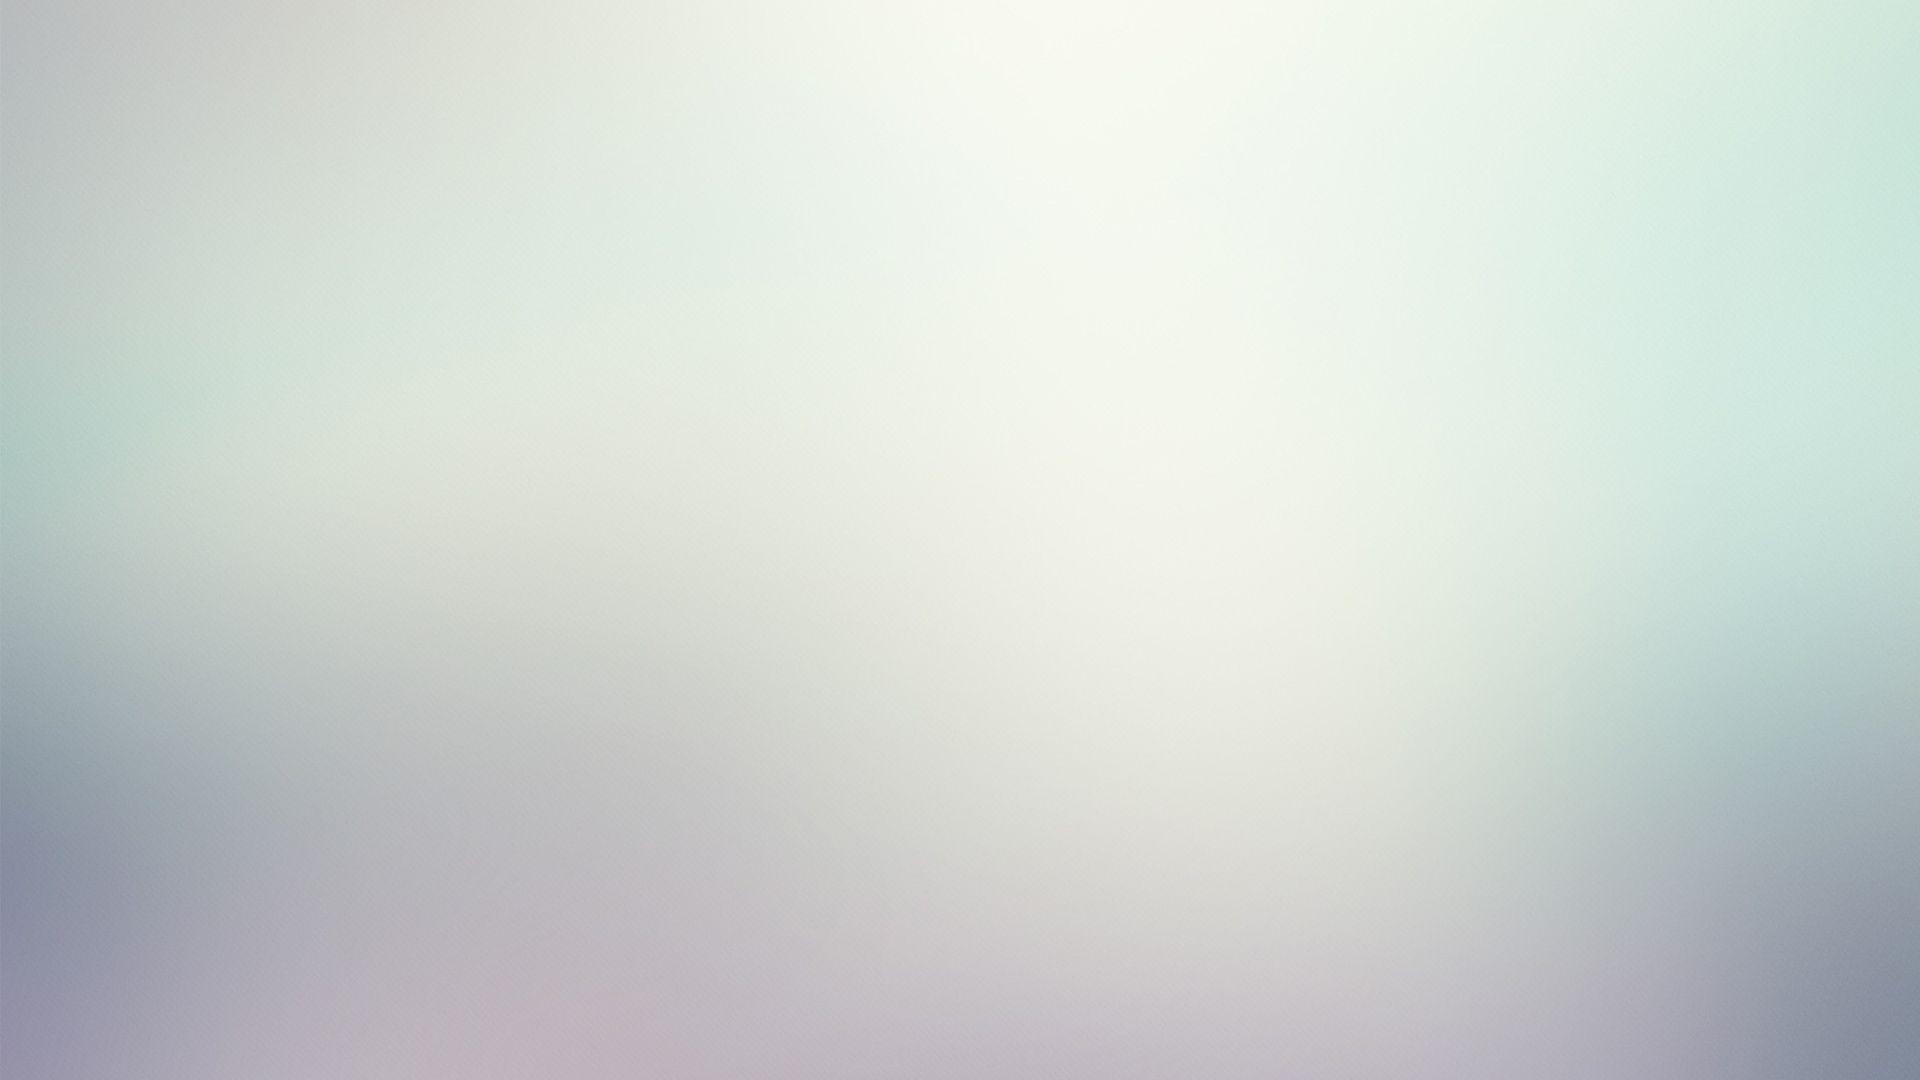 Gray Gradient Wallpaper HD 9 Color High Resolution